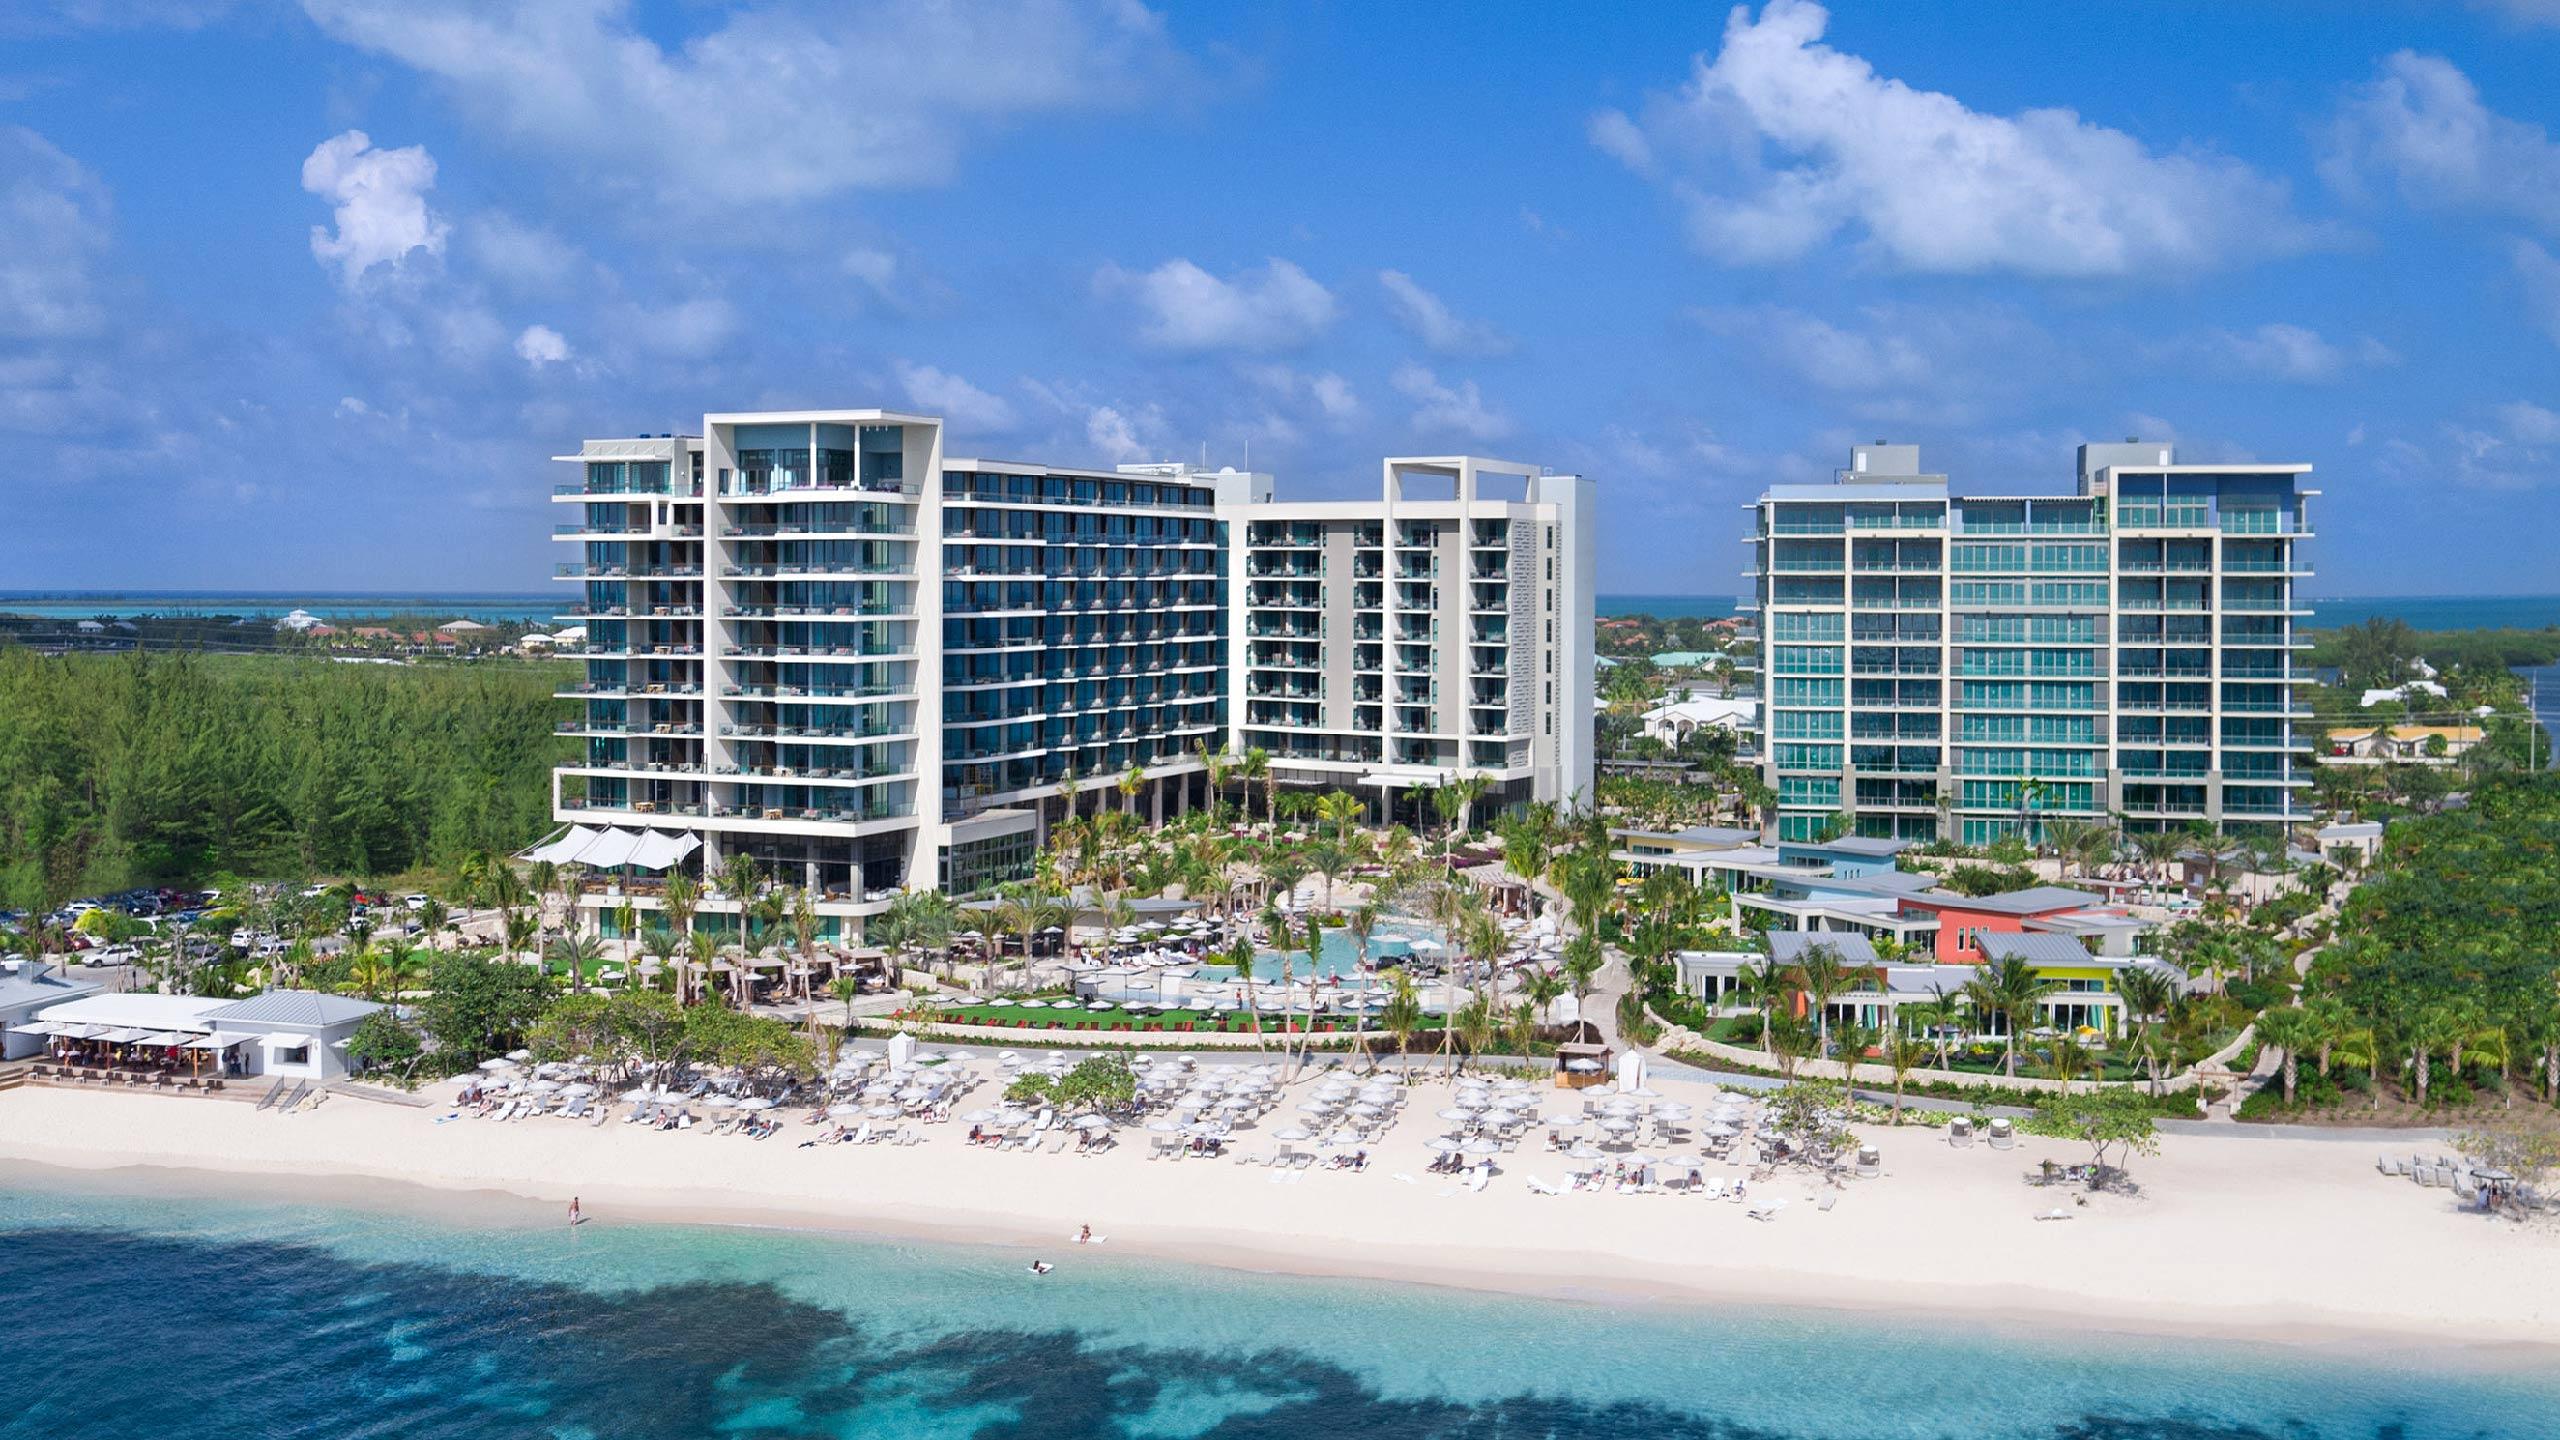 Photo of Kimpton Seafire Resort in Grand Cayman, Cayman Islands.